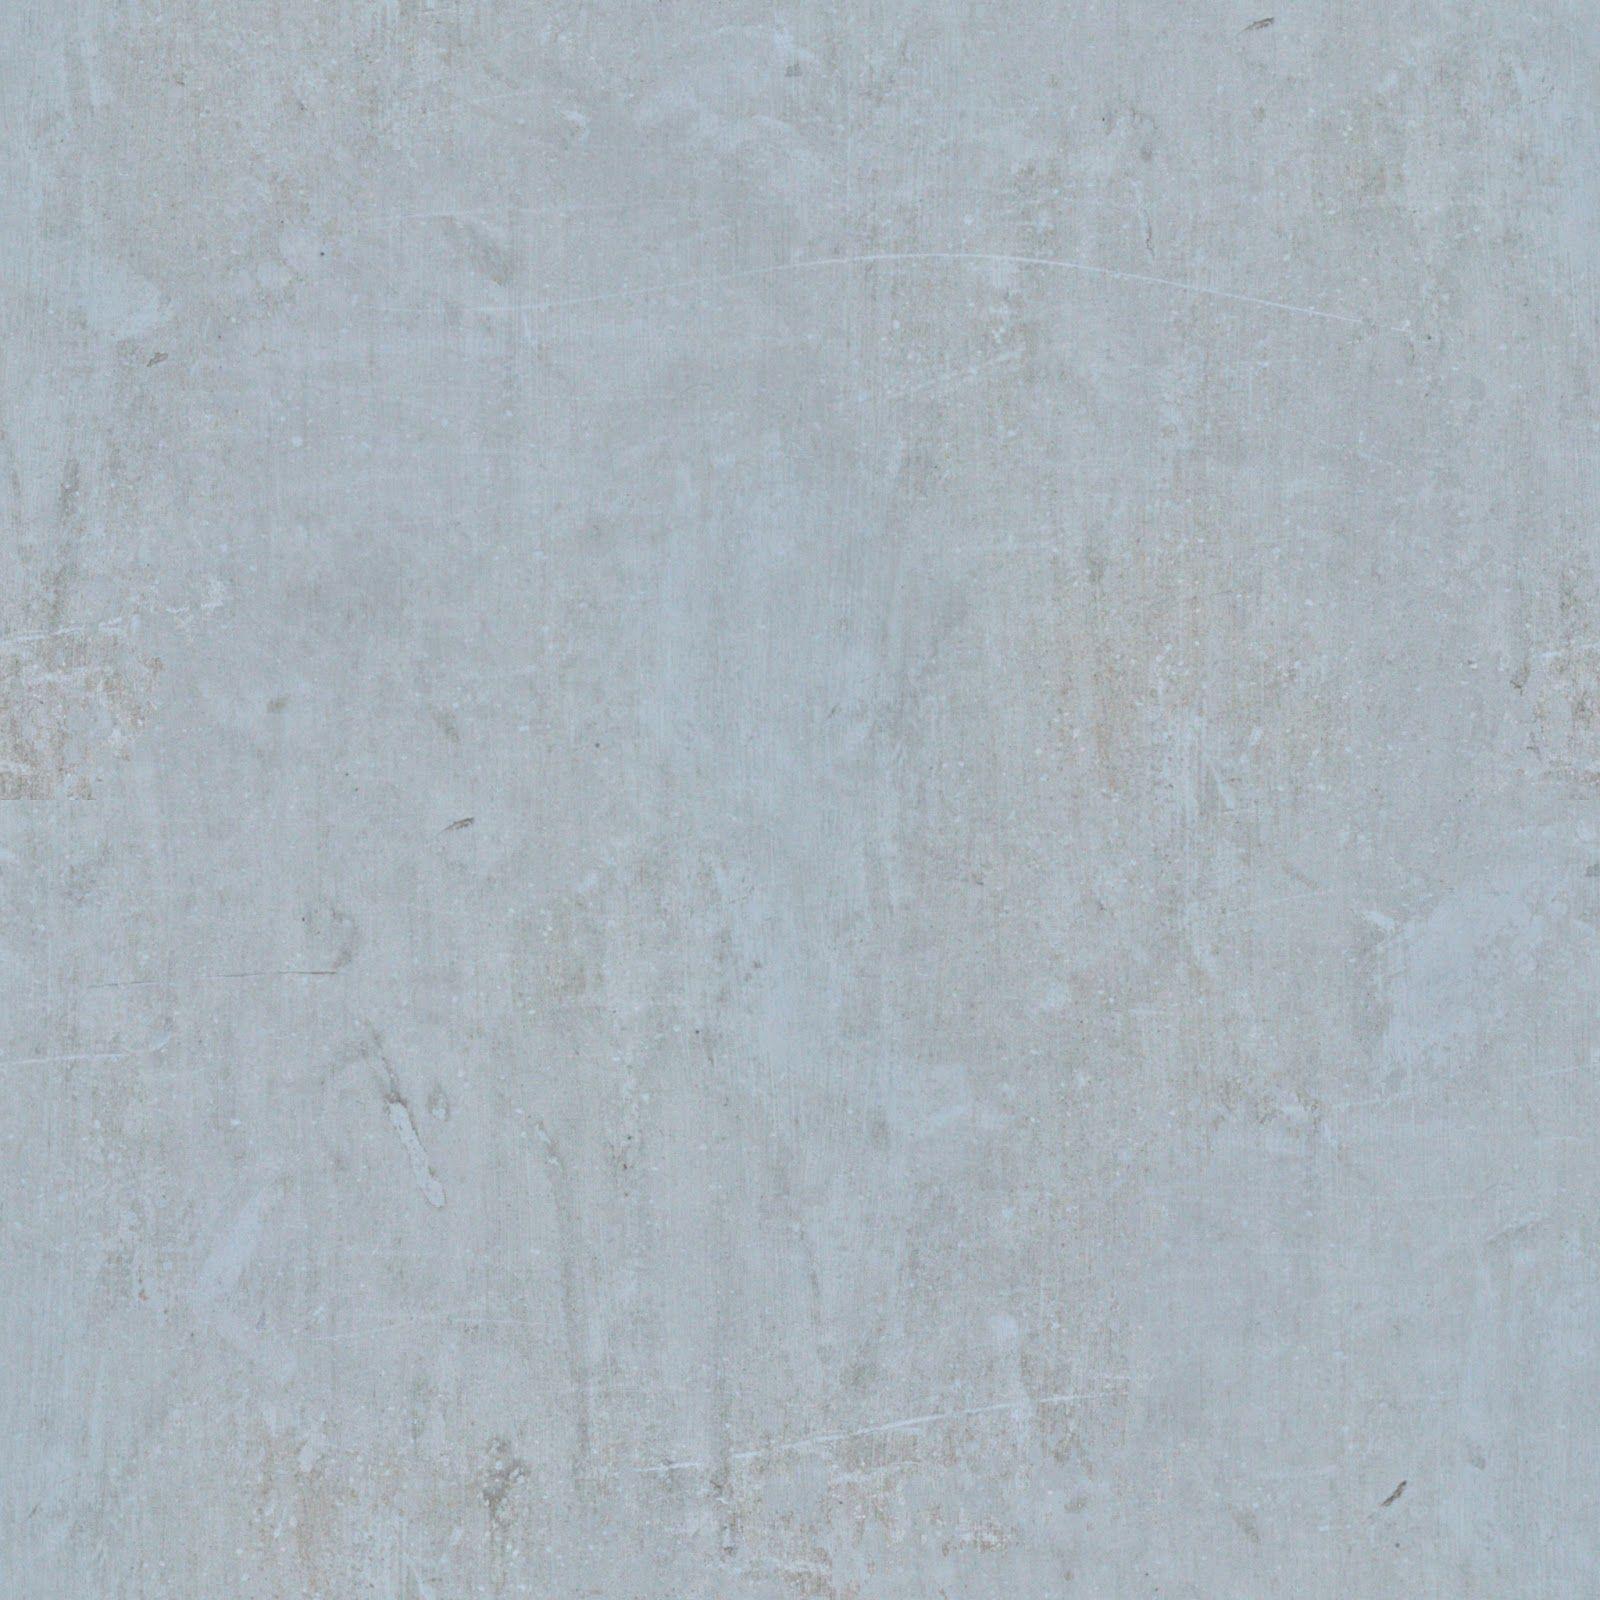 Free Seamless Texture Library Concrete Texture Seamless Textures Concrete Wall Texture